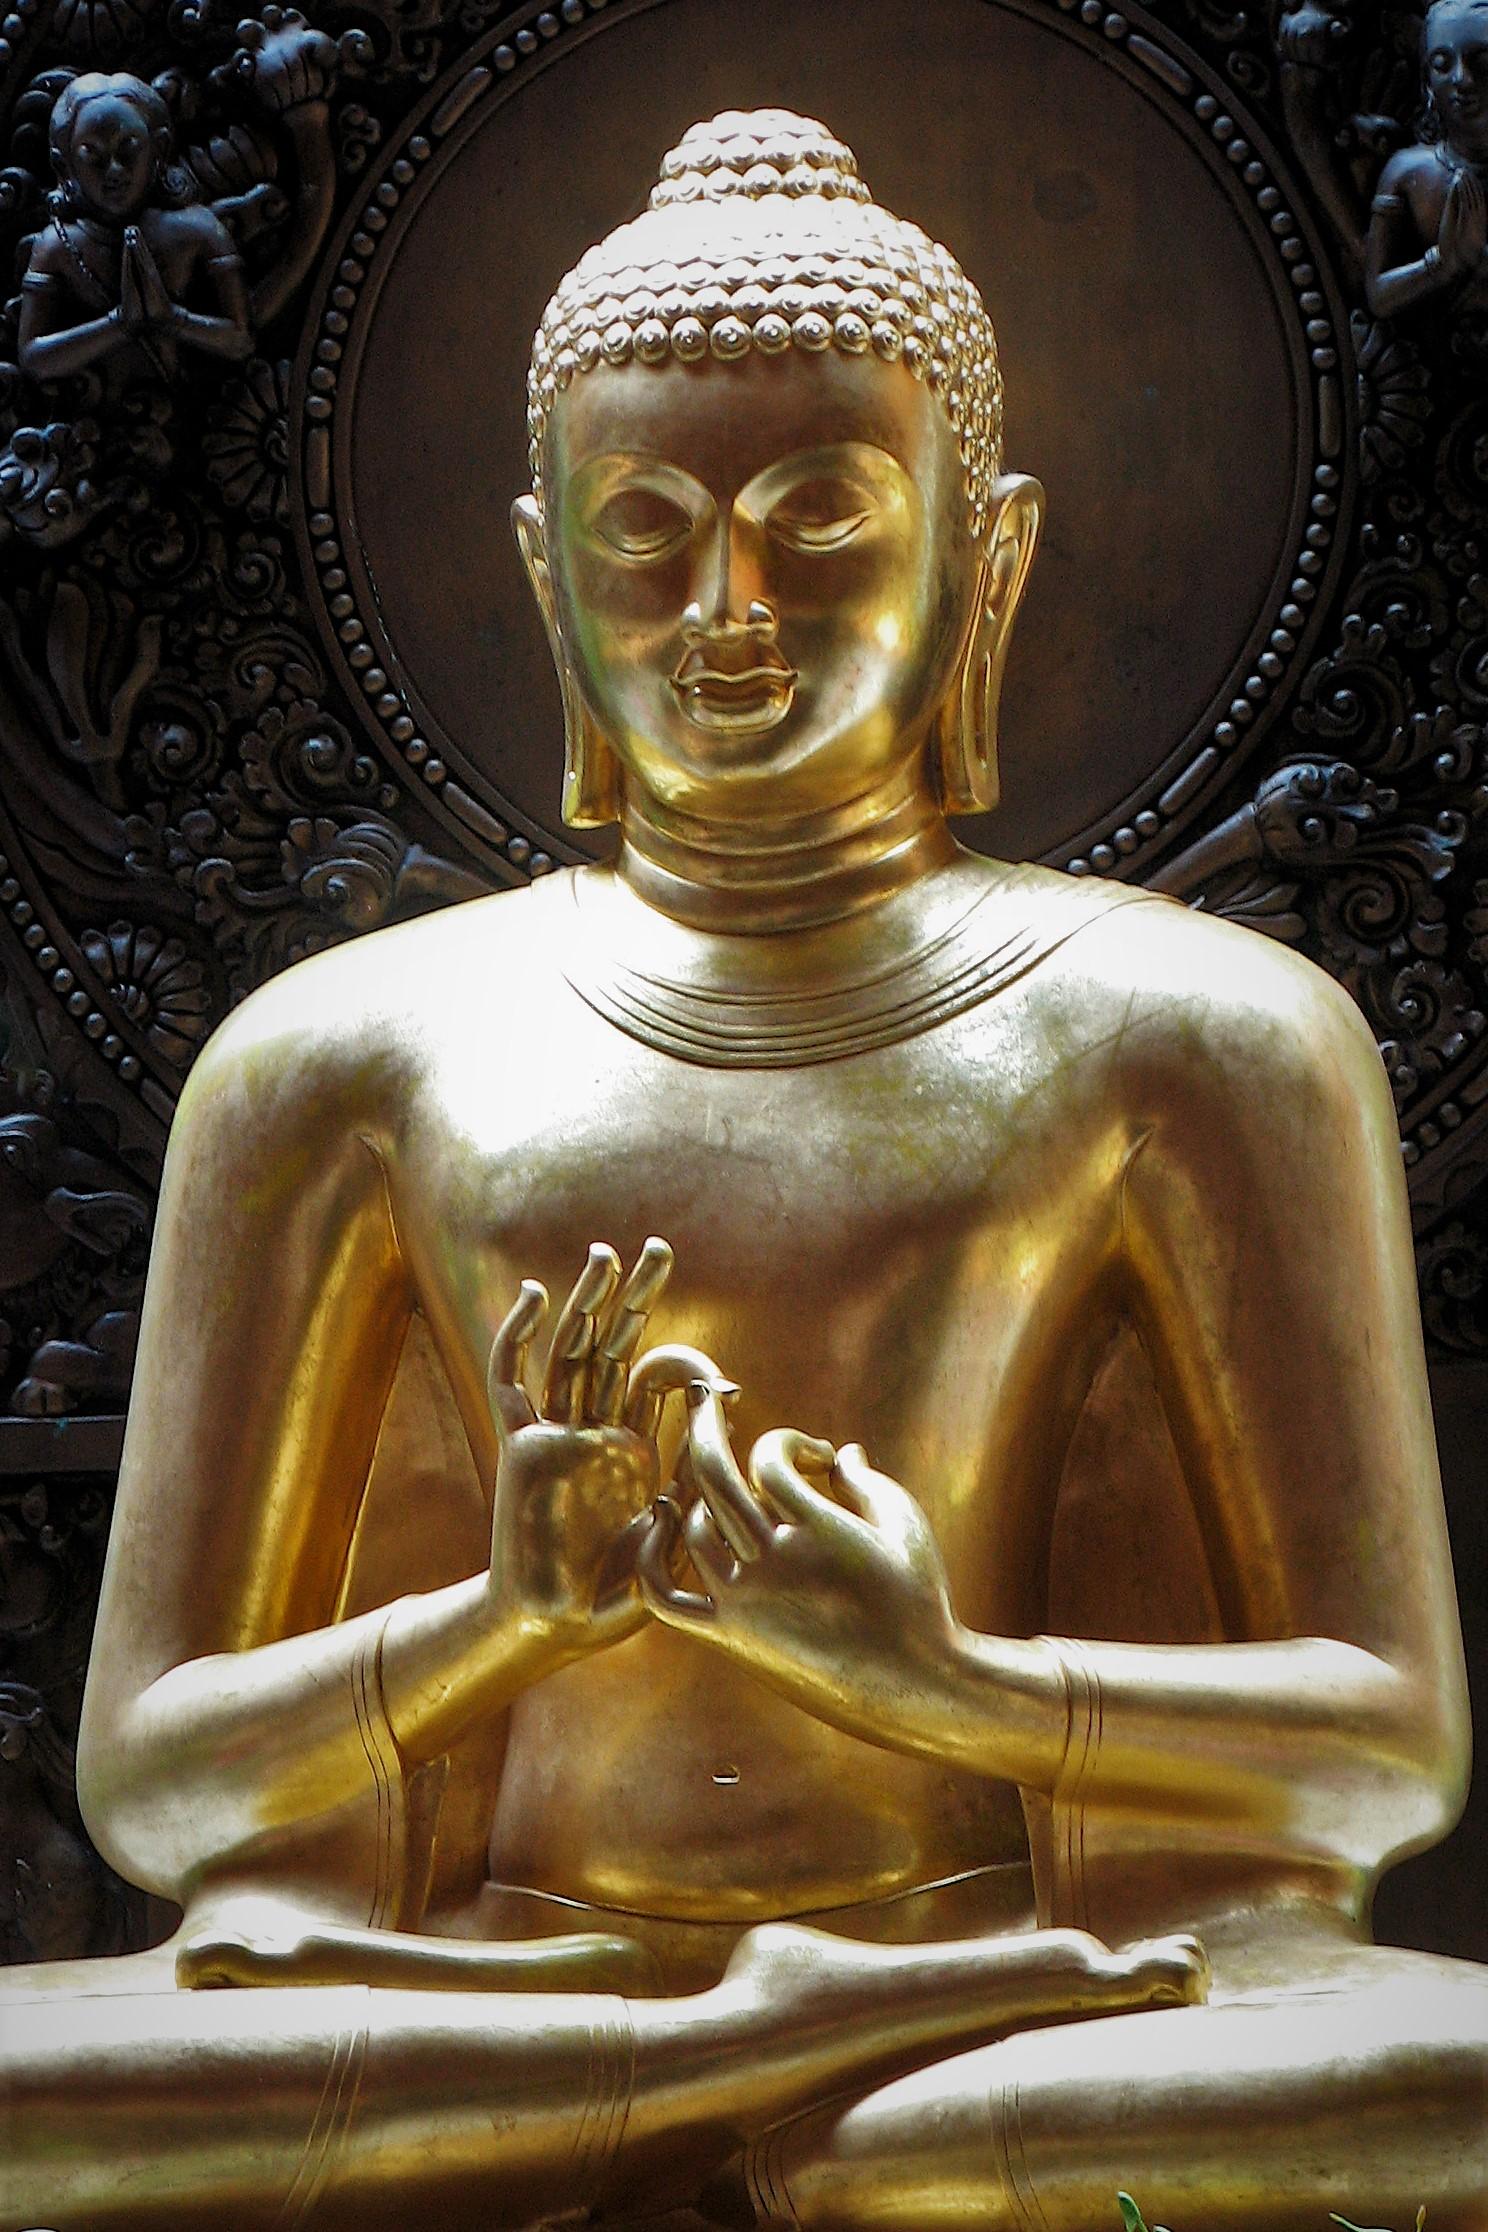 Buddha IMG_4262 crop.jpg